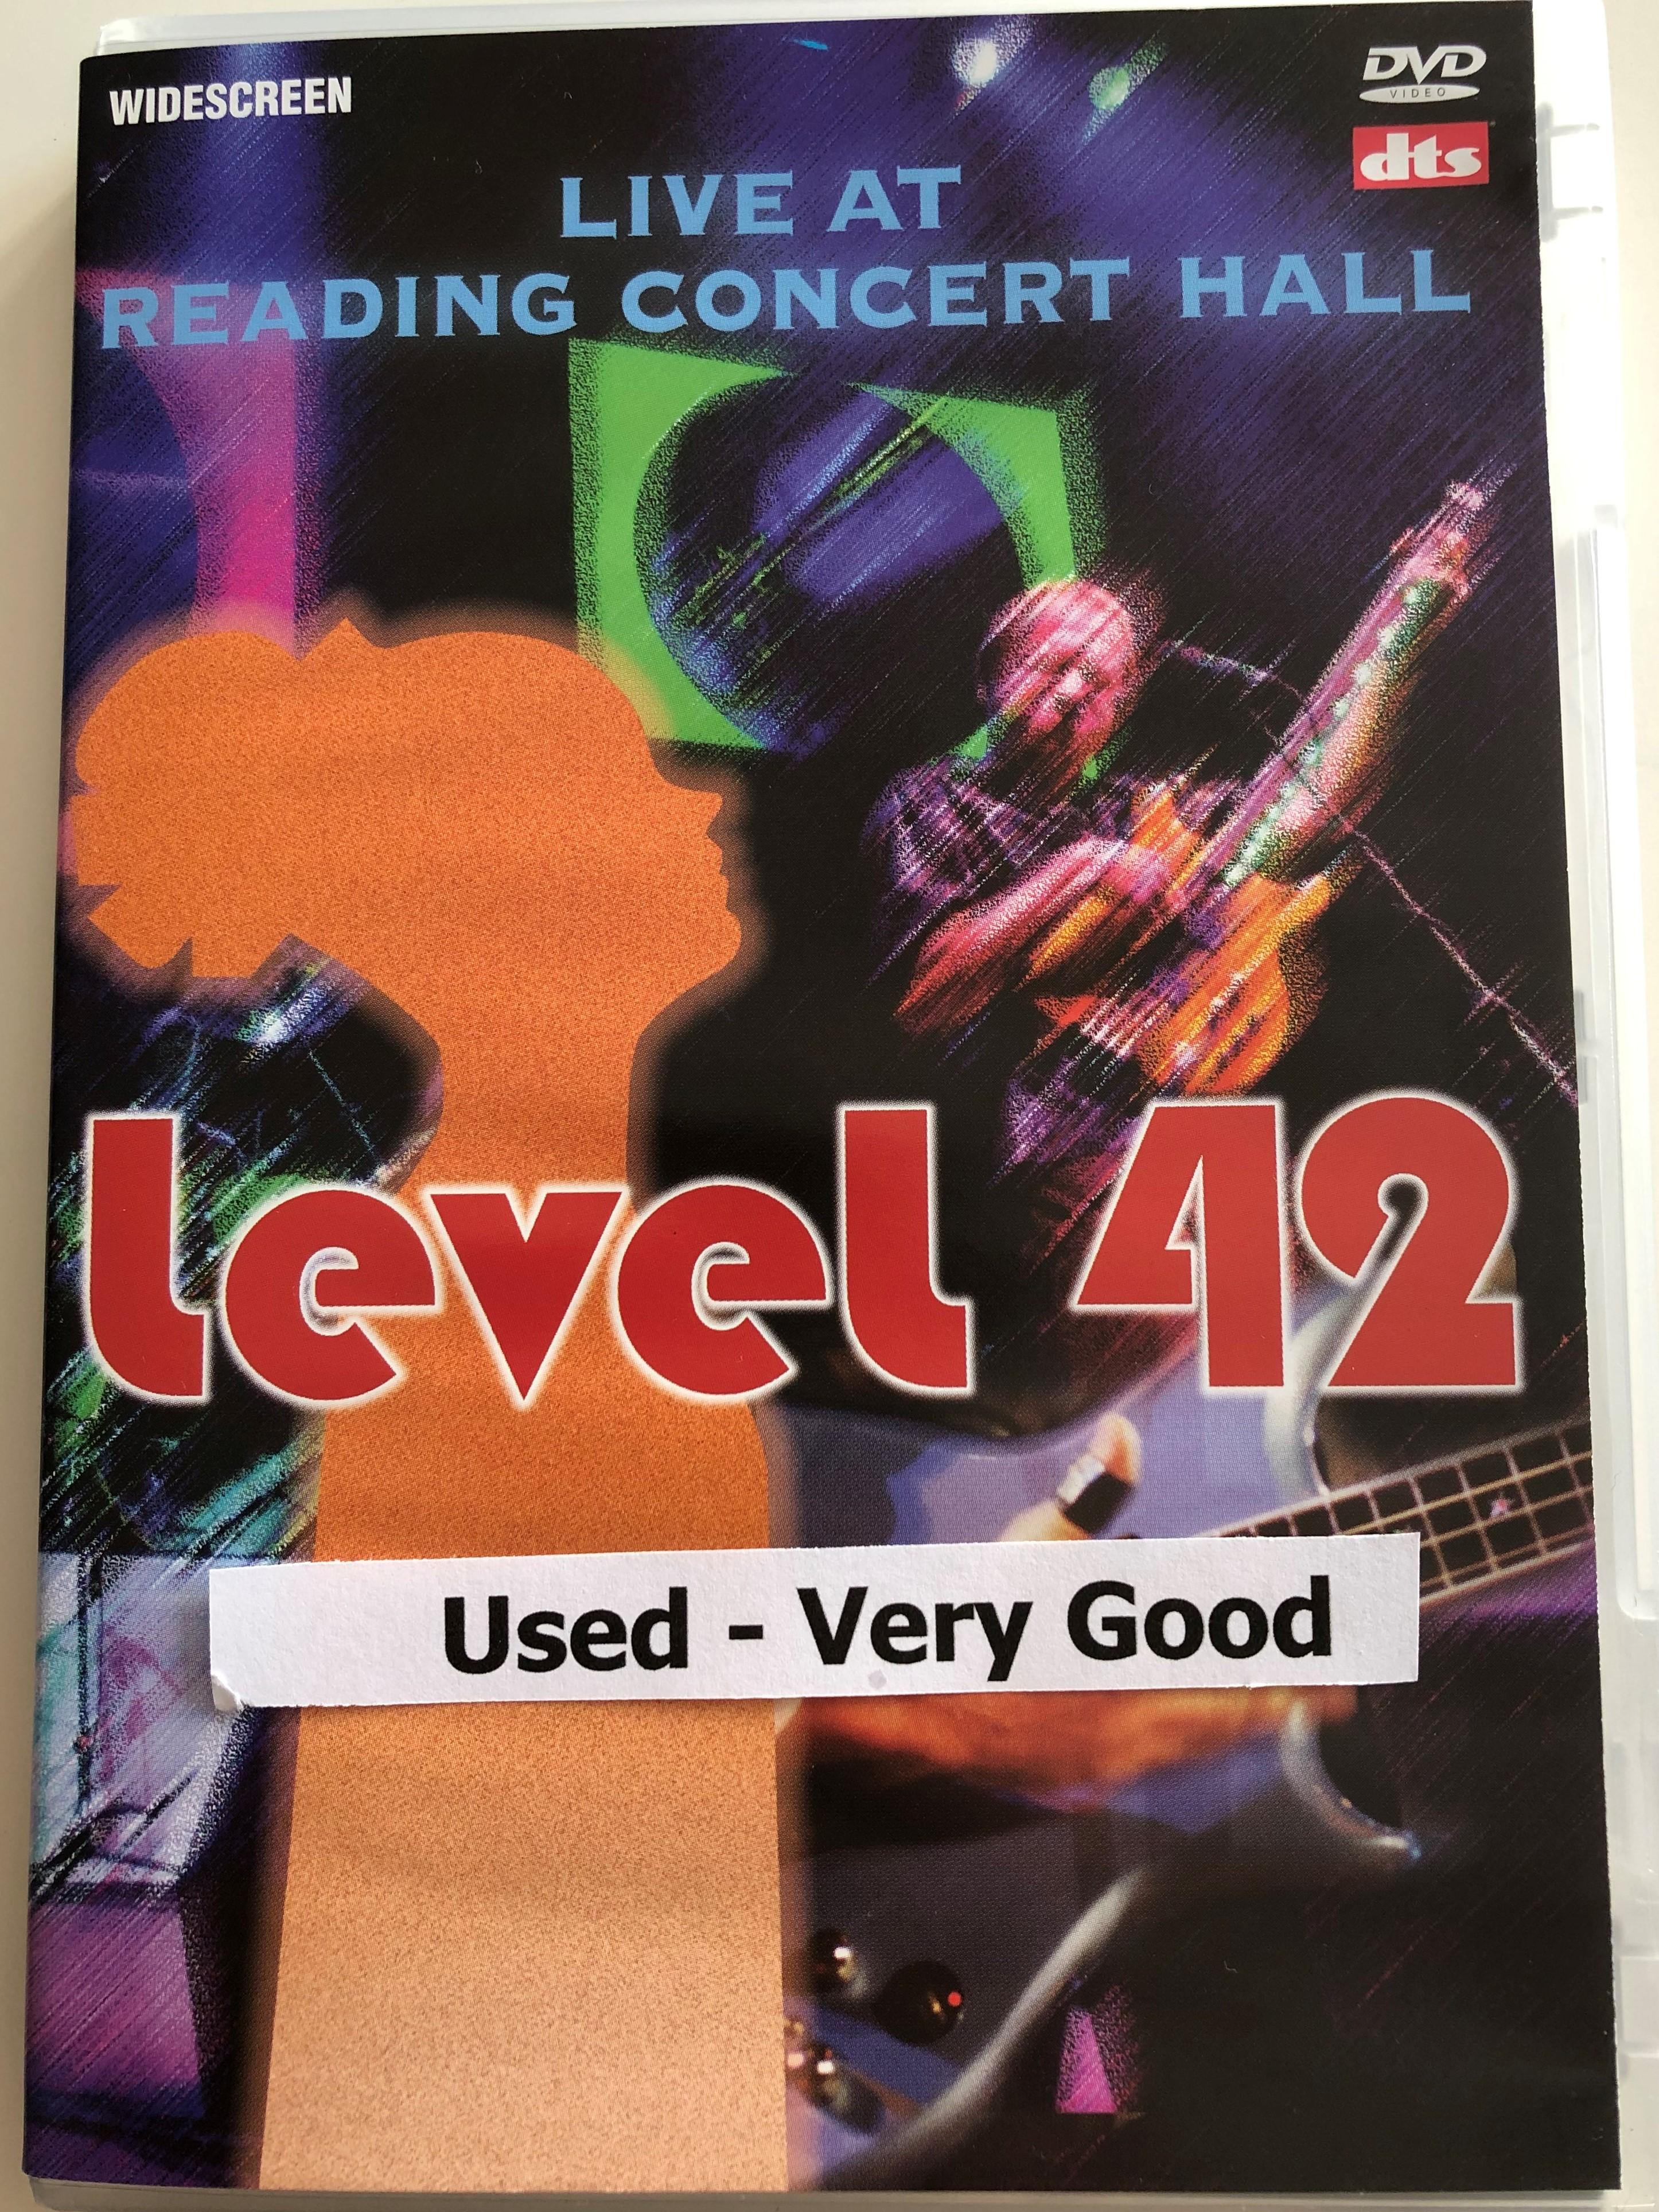 level-42-dvd-2001-live-at-reading-concert-hall-2.jpg